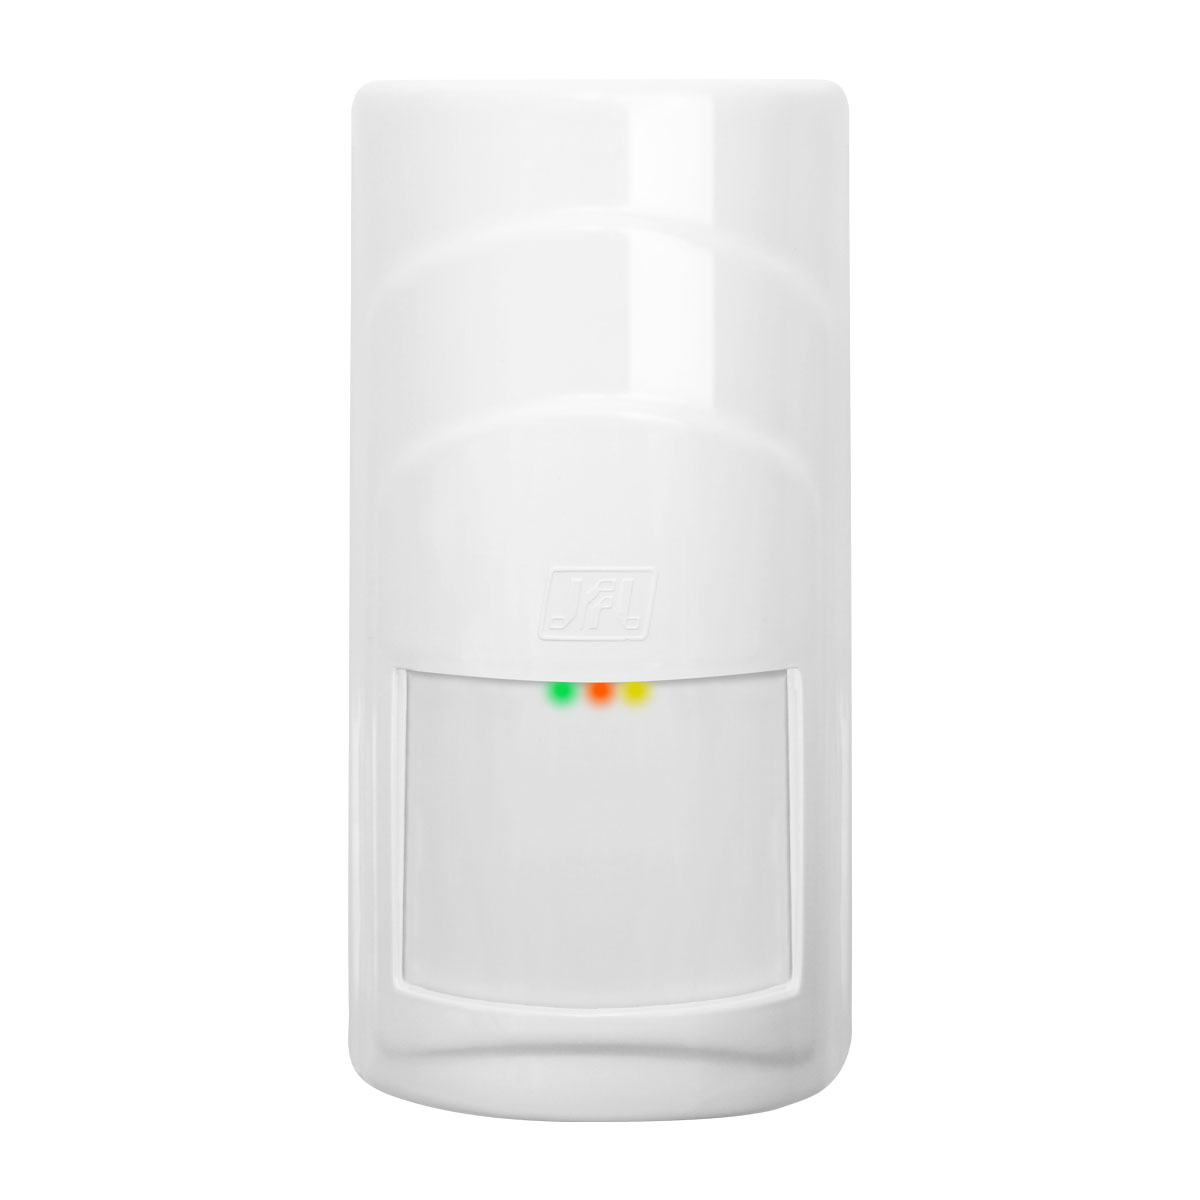 Kit Alarme Monitorado Active 32 Duo Sensores Tec 550 e Dse 830 Jfl